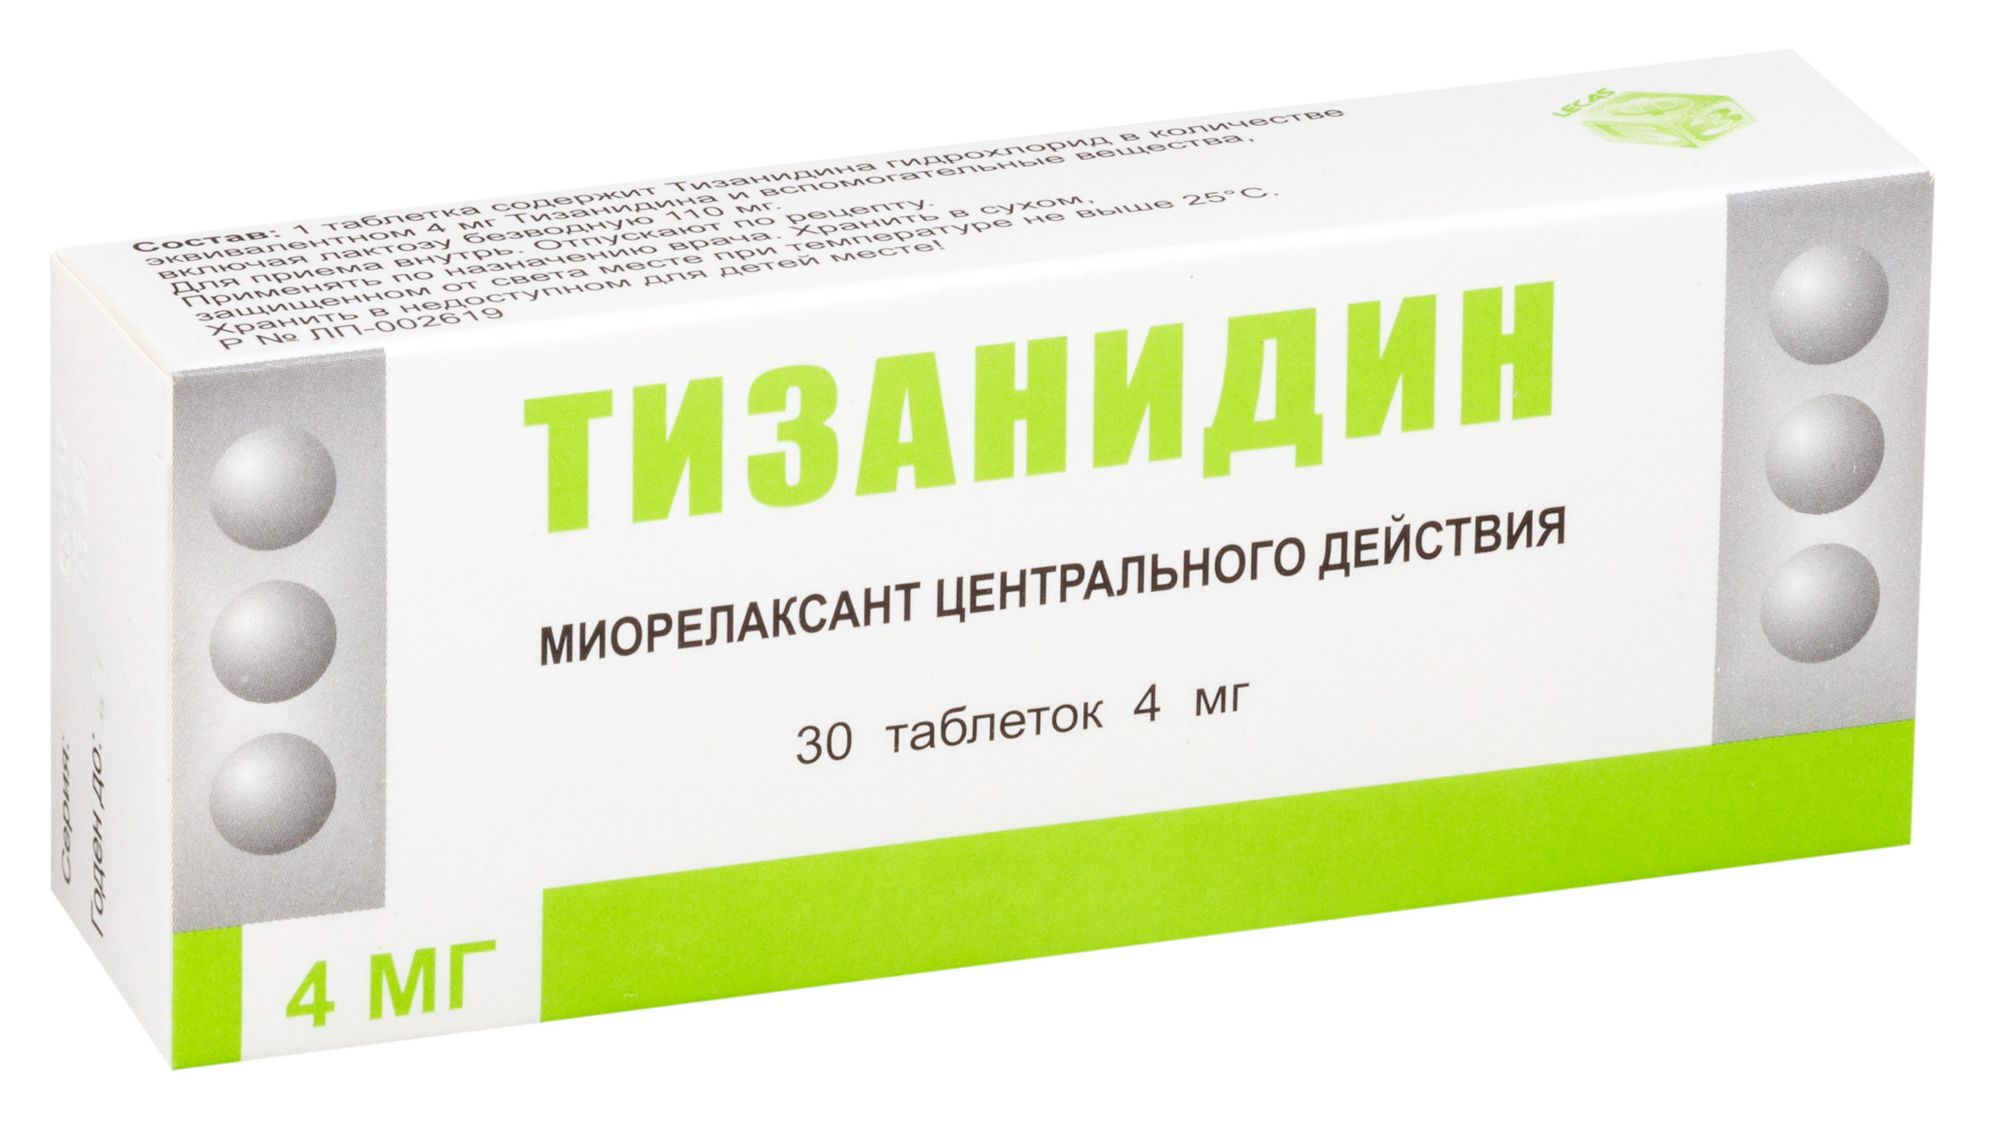 фото упаковки Тизанидин